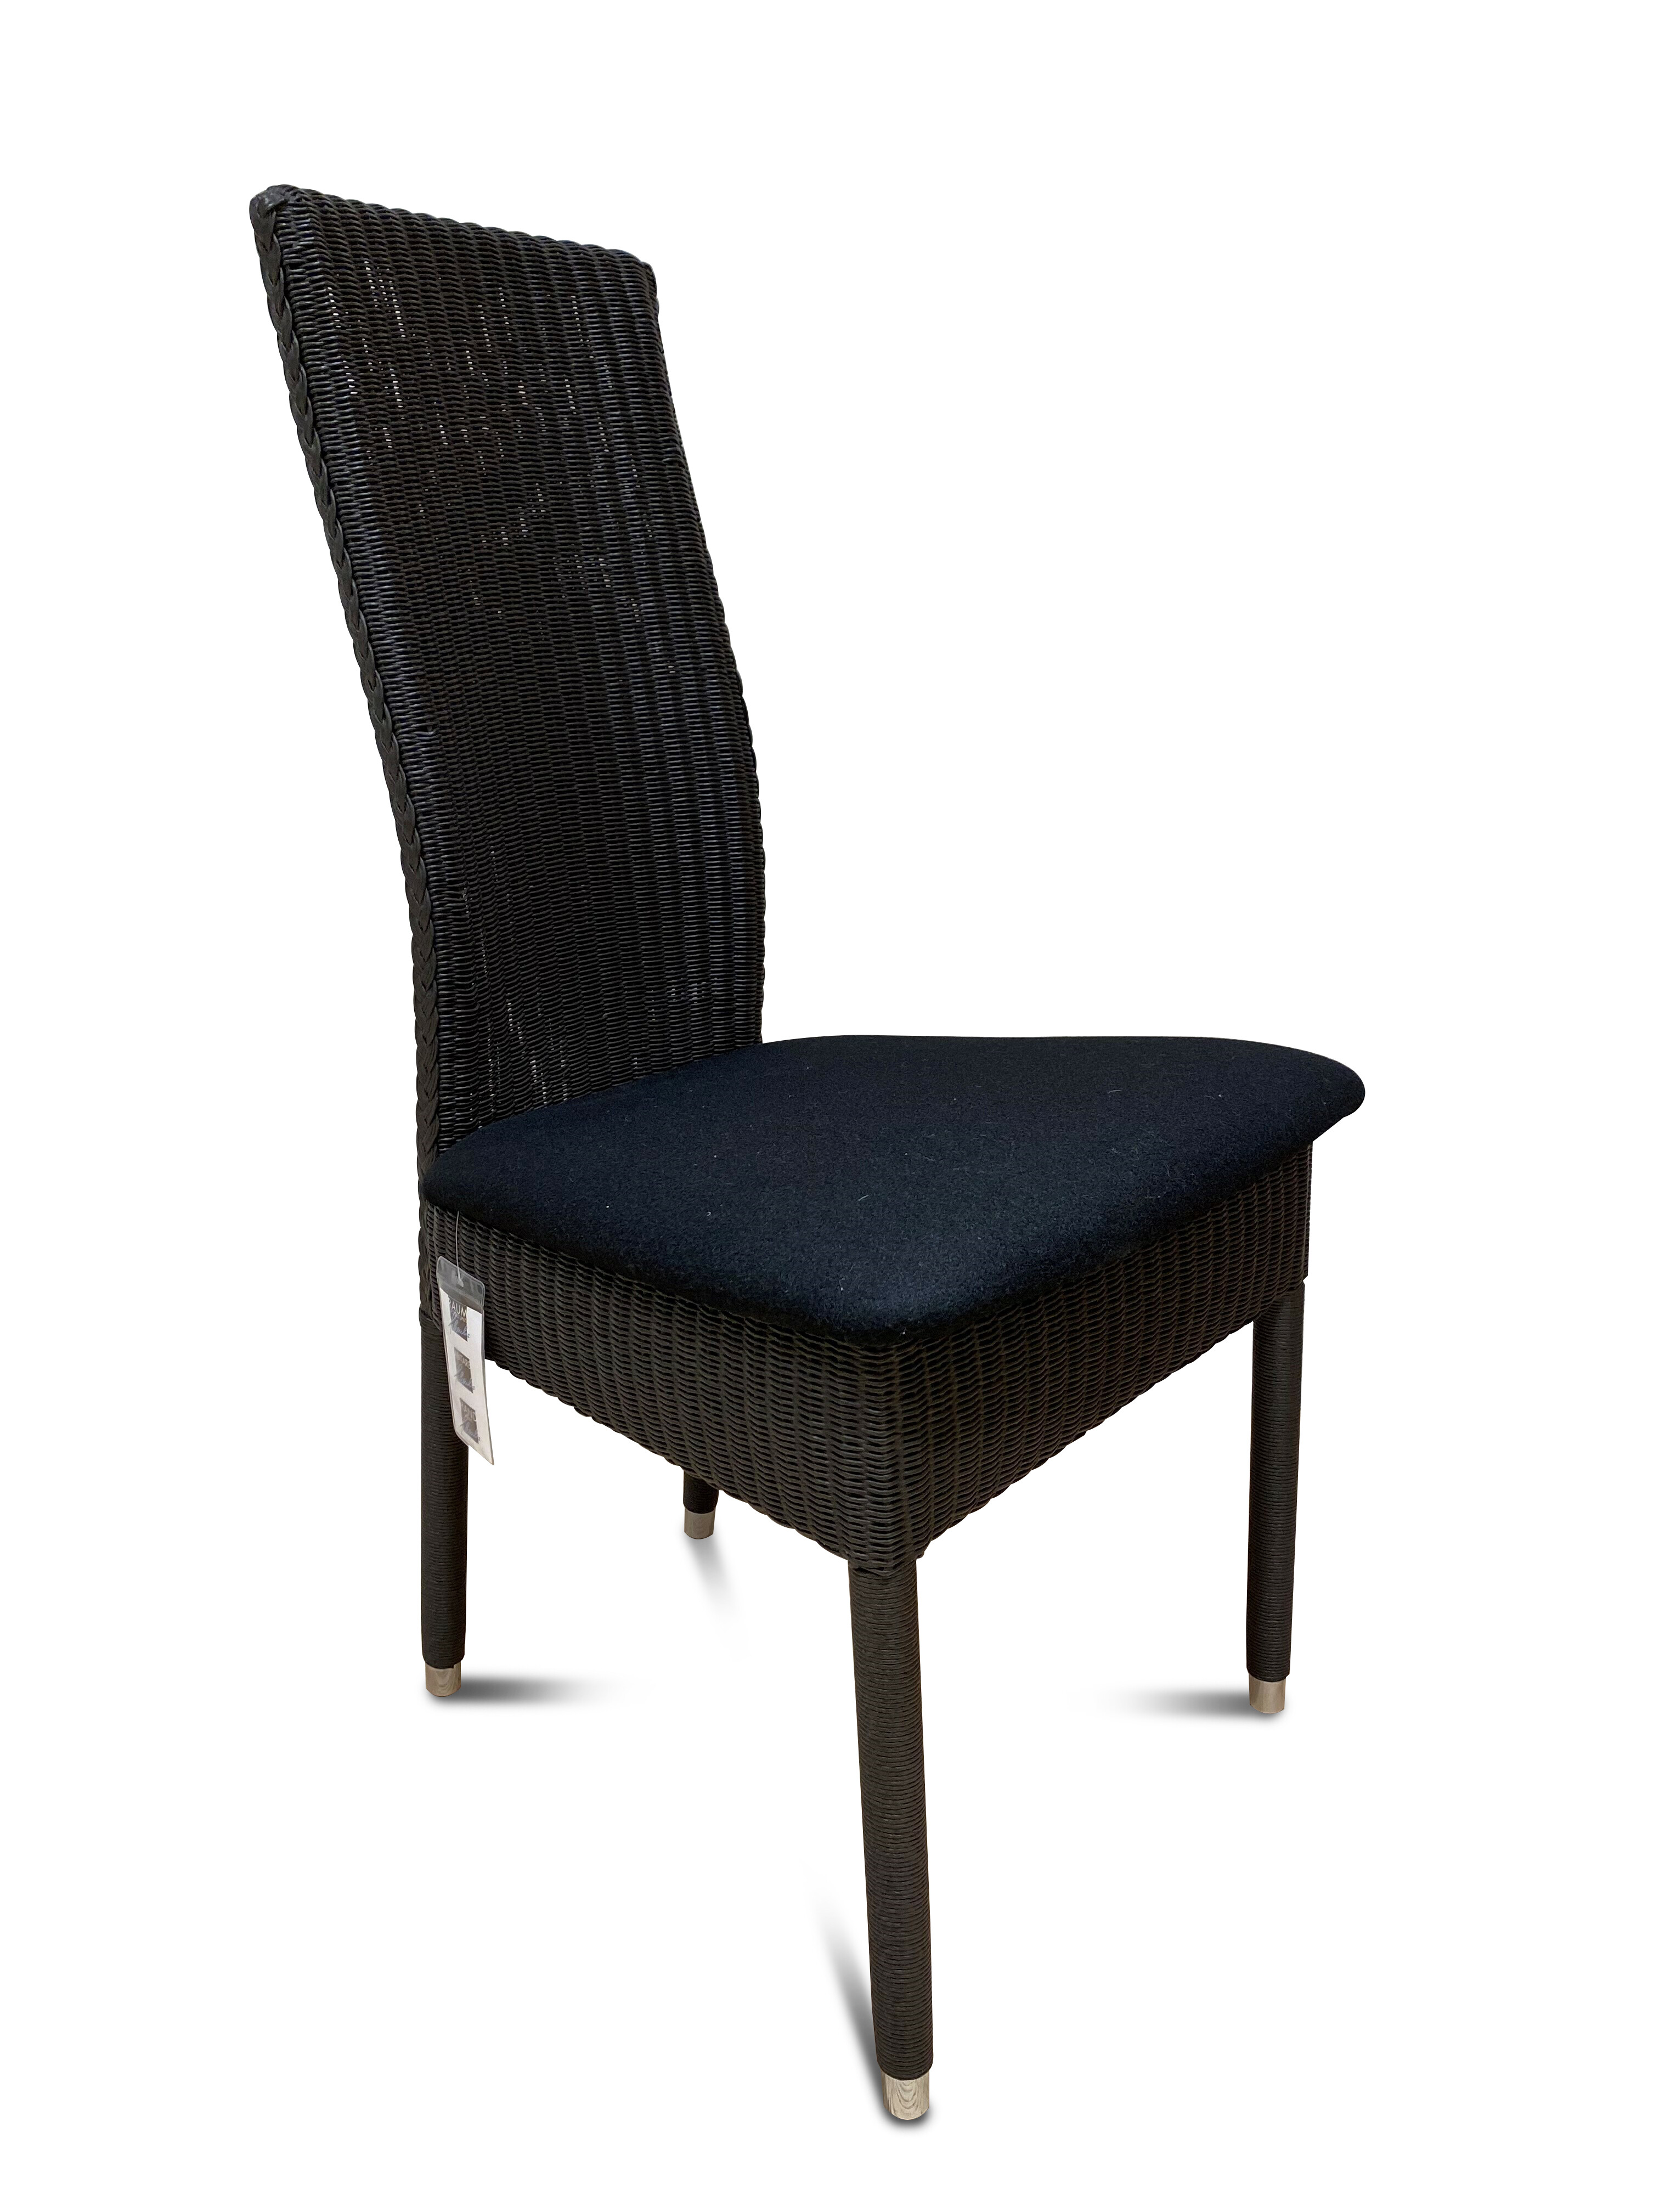 Accente Stühle Modell Luna 4 Stück 05